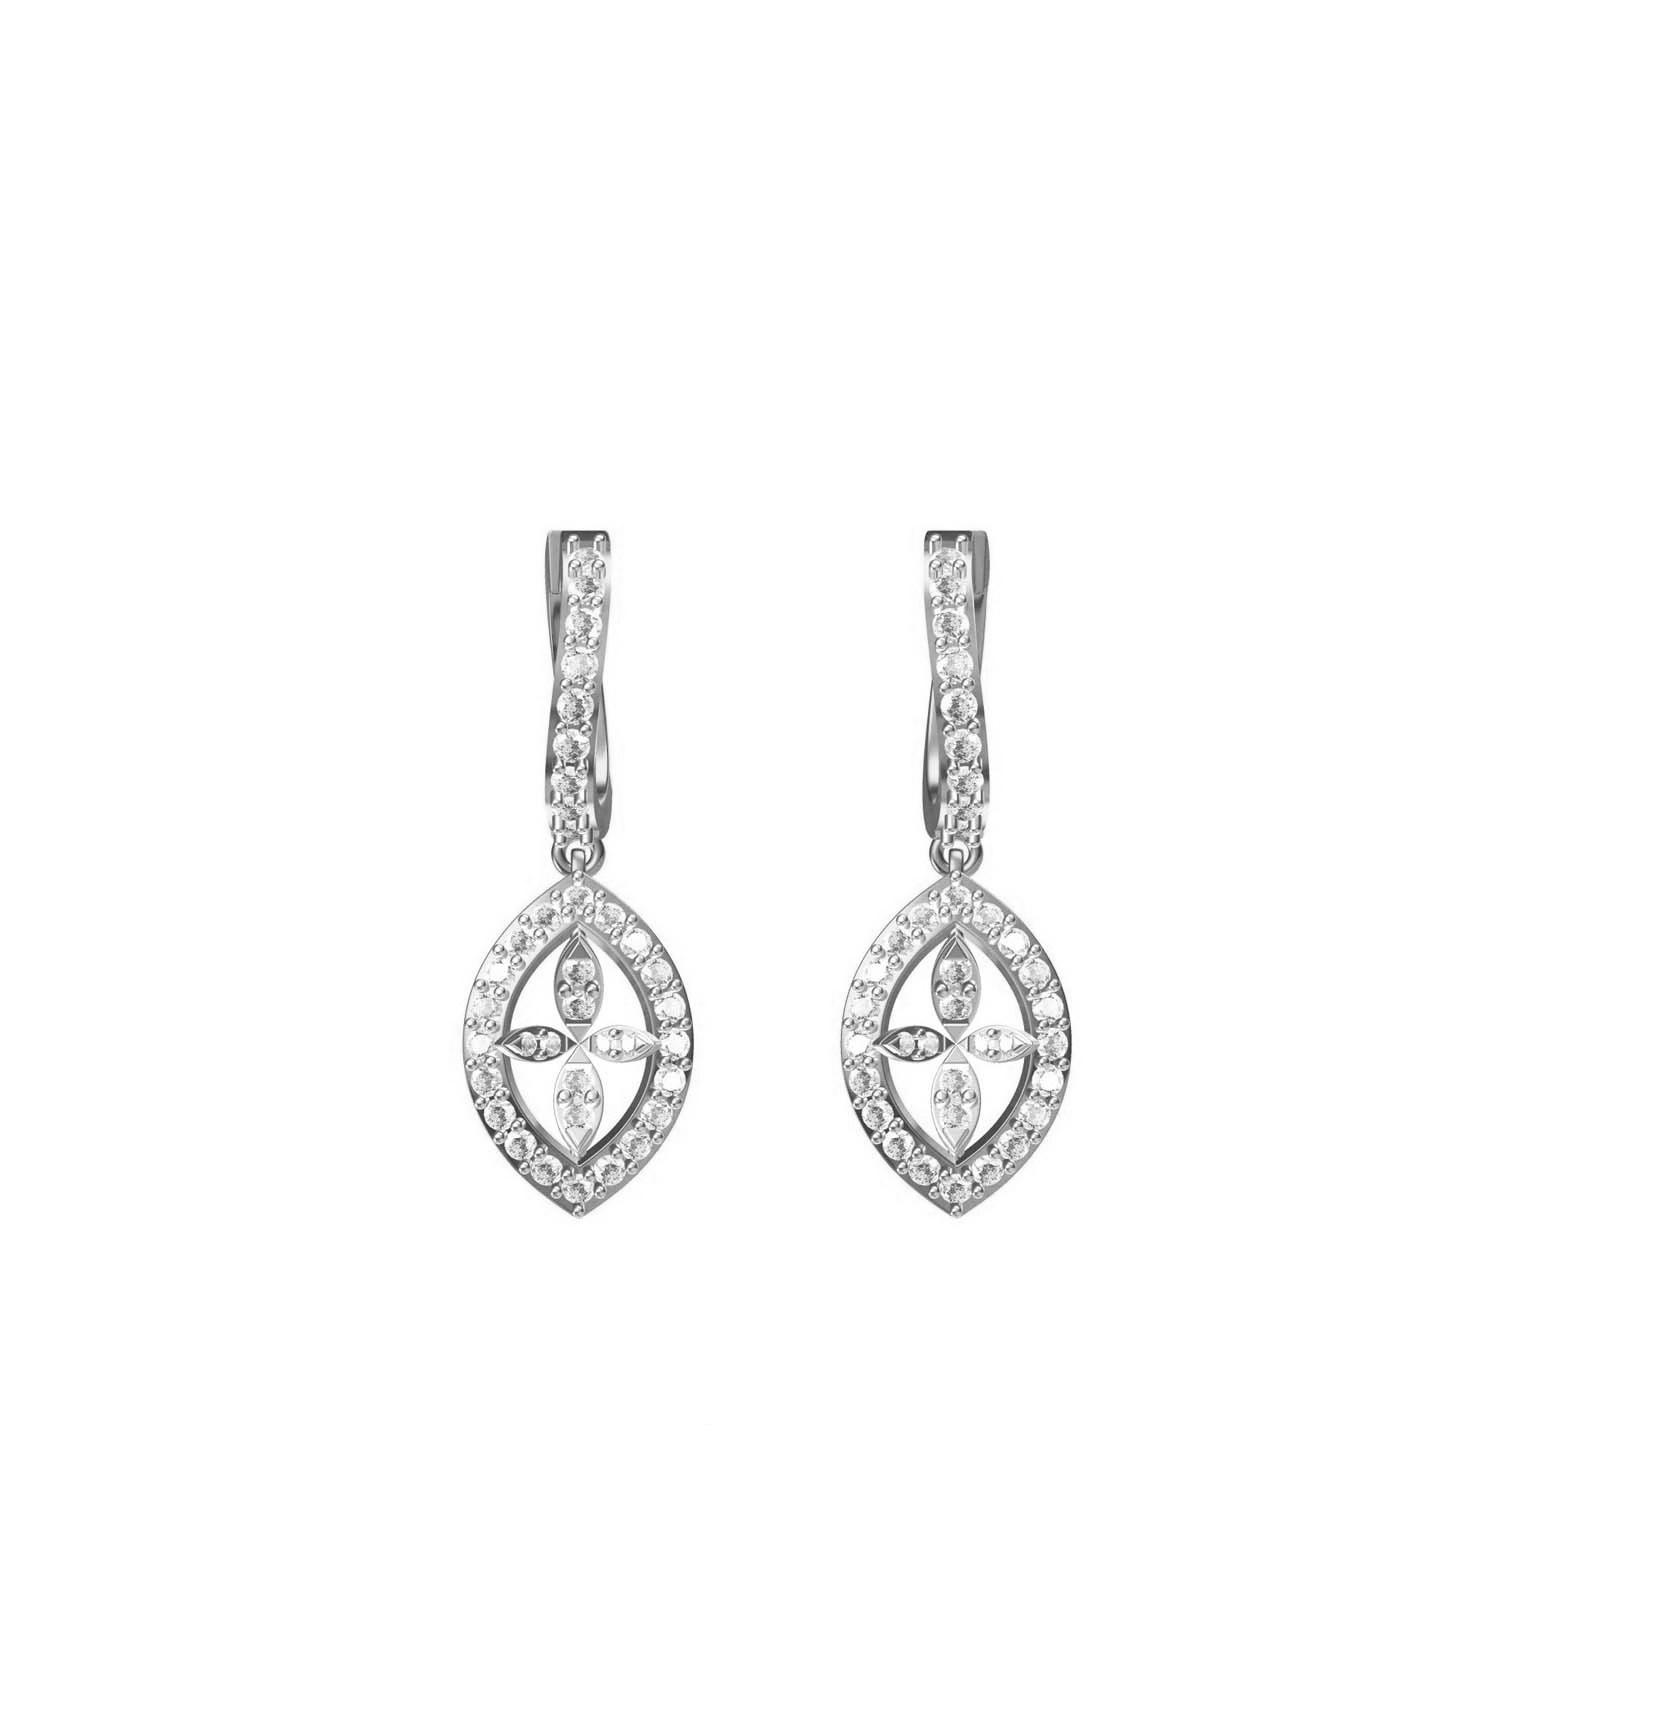 Diamond Earring TCW 1.444 14K gold 7.3 gm